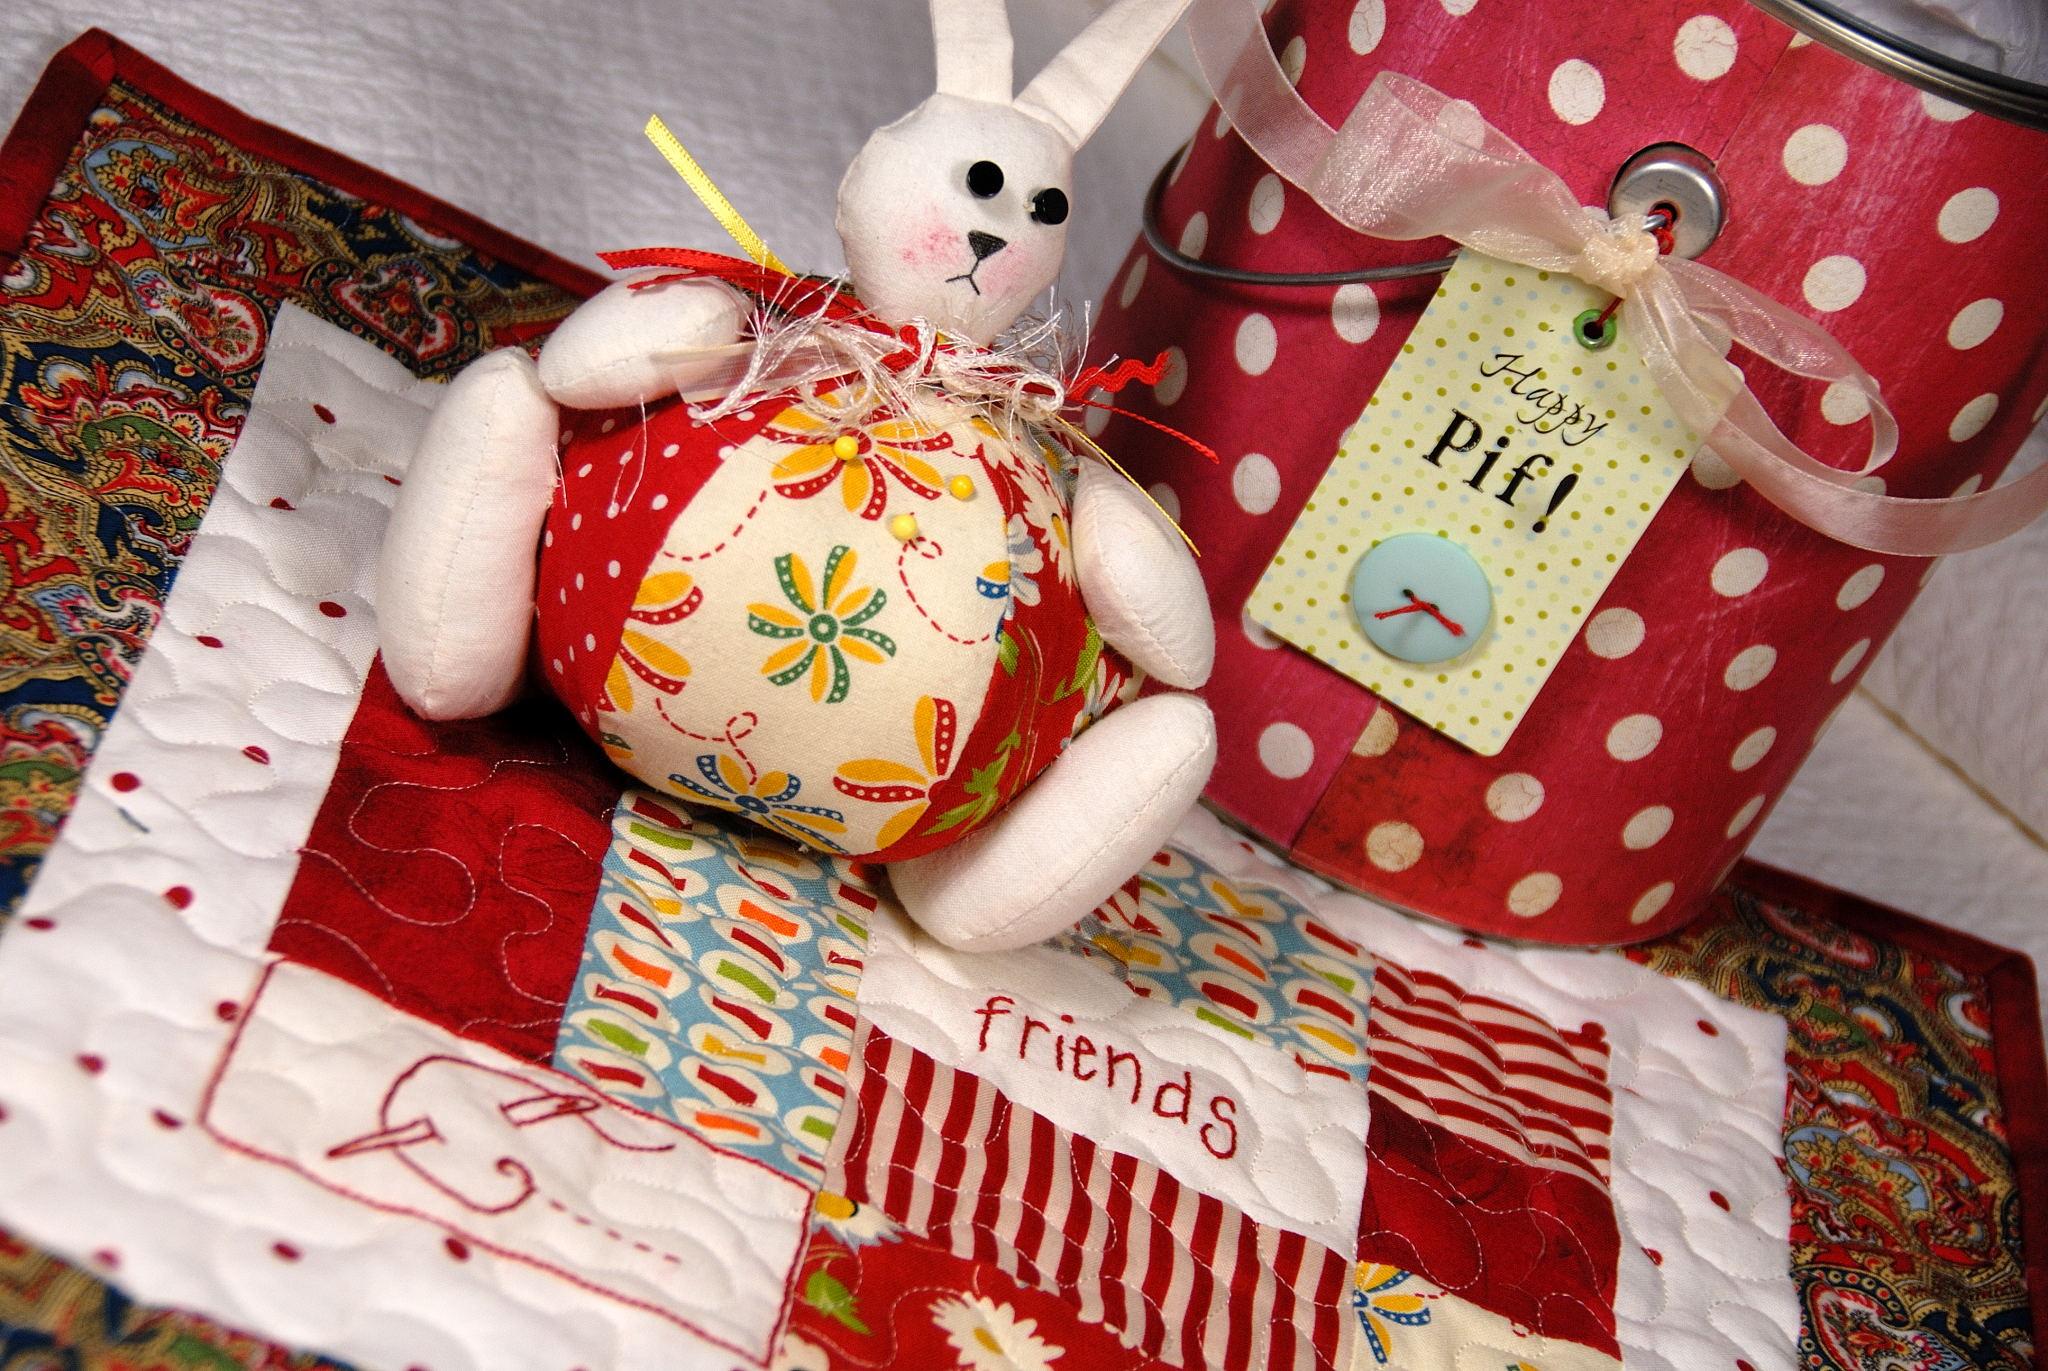 Sharon's Bunny